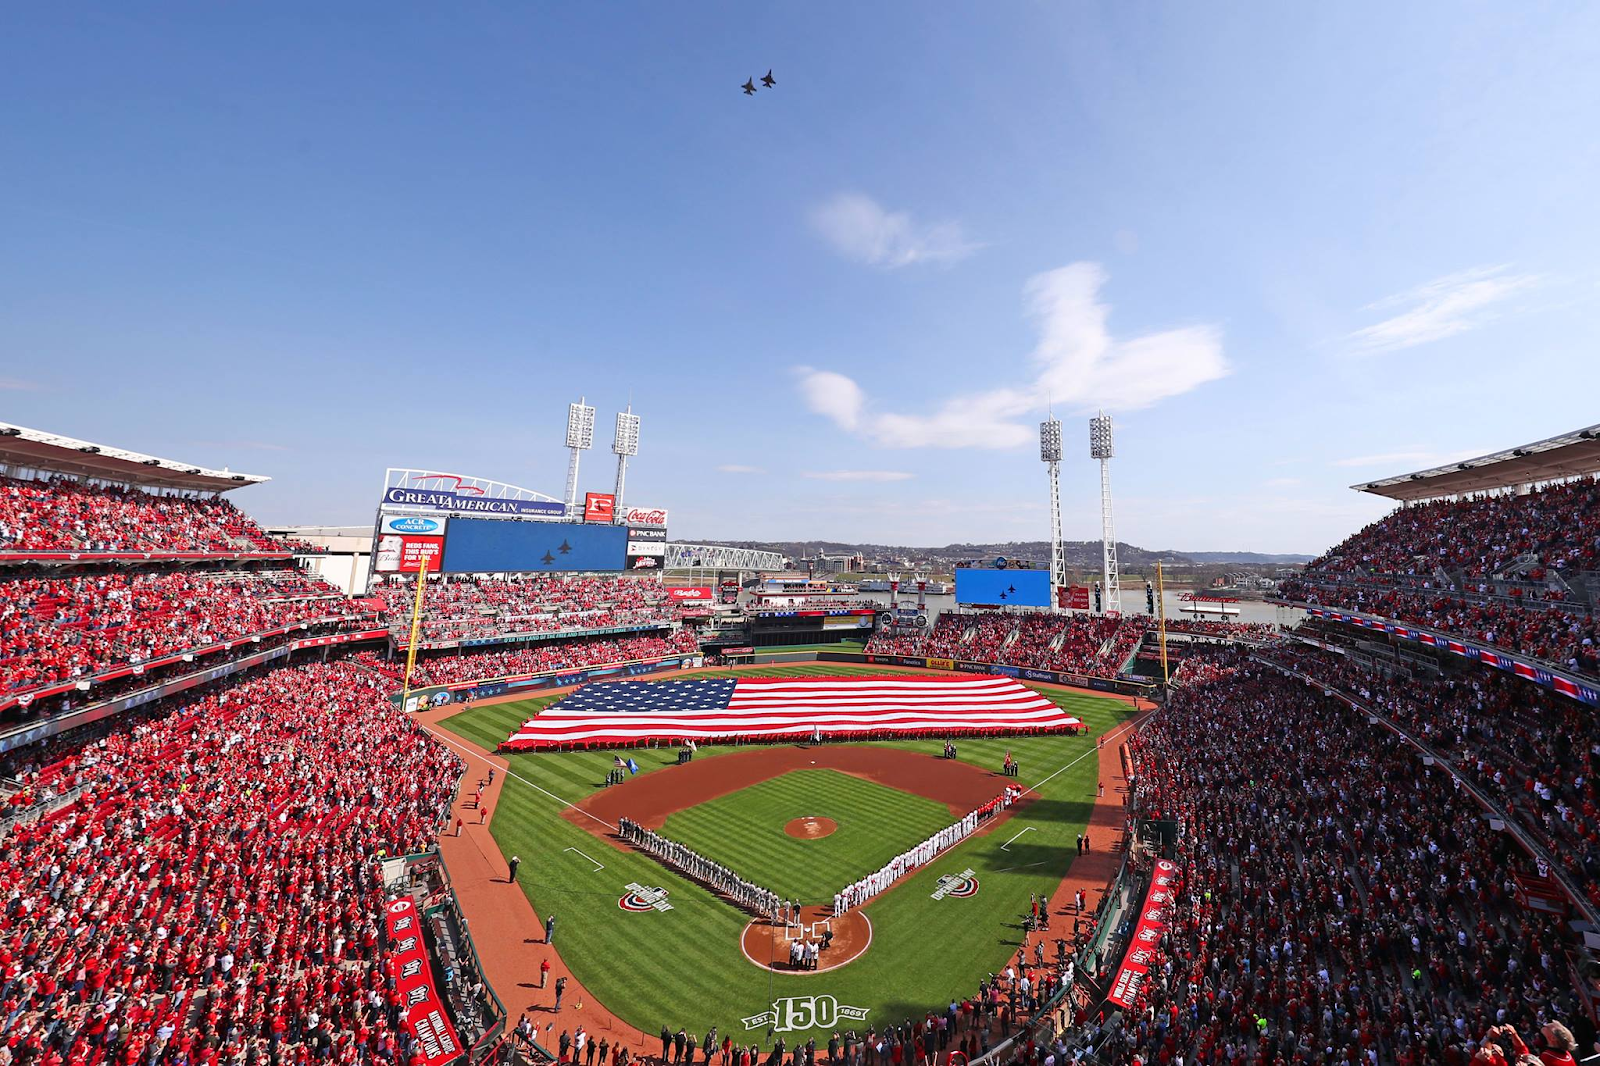 Cincinnati Reds game